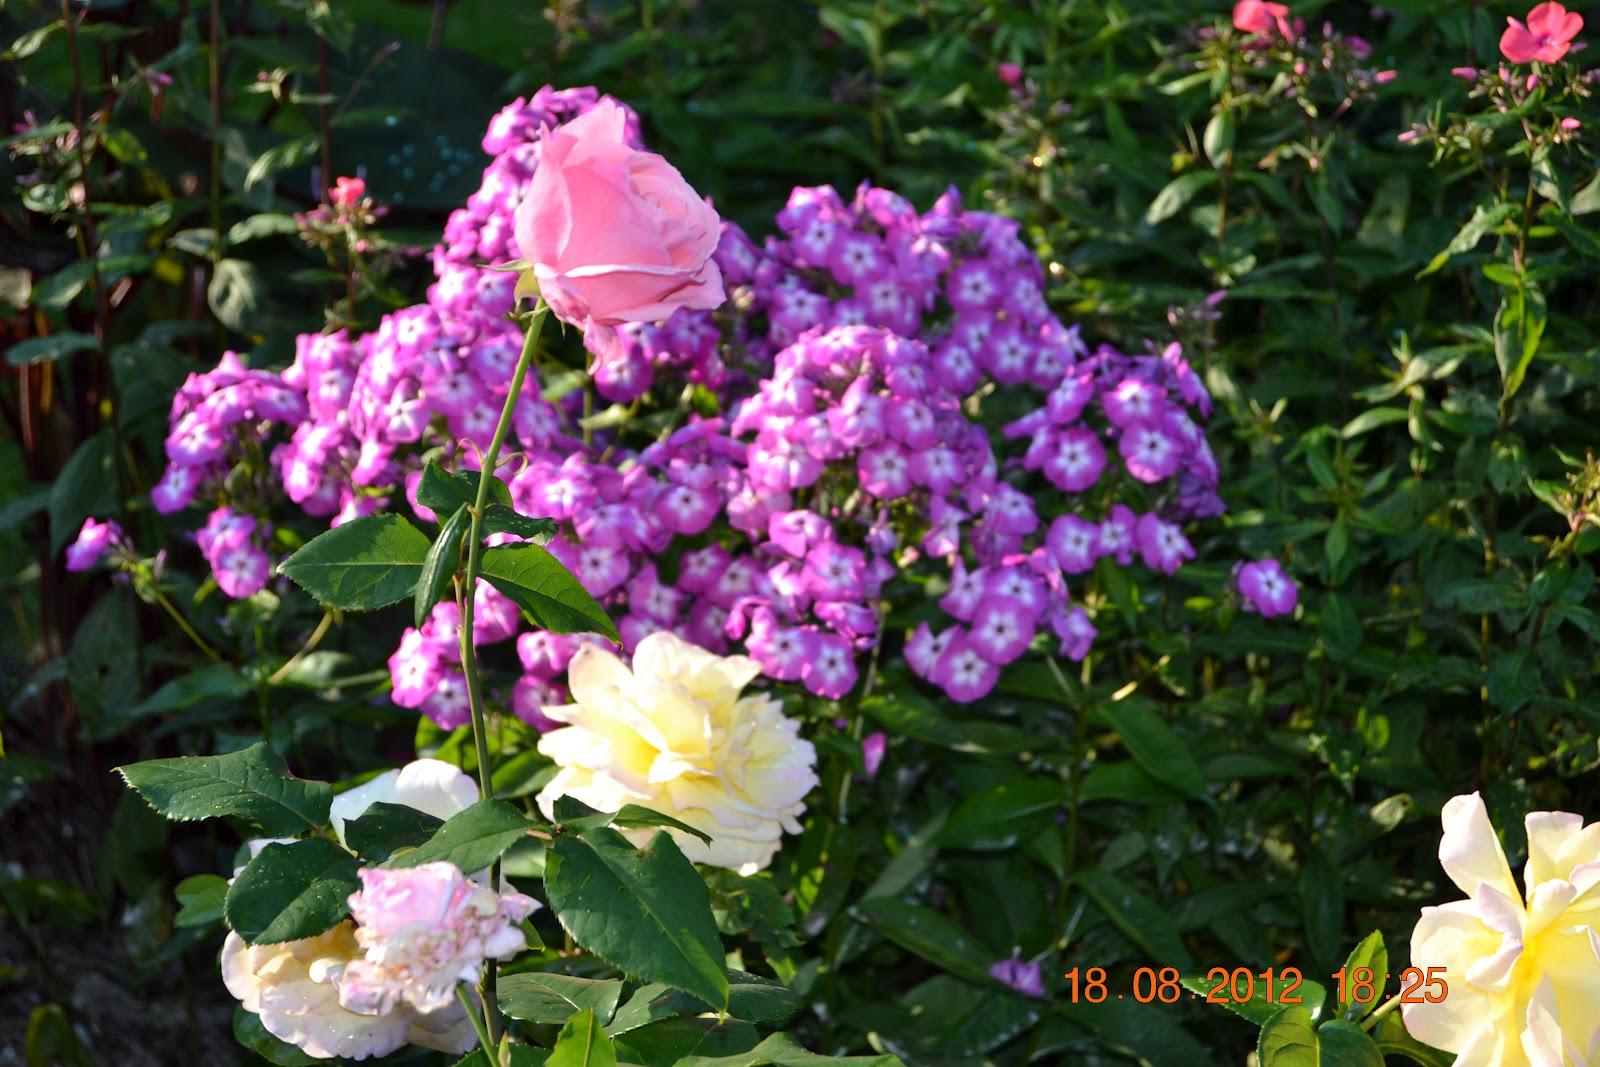 Ruusut ja syysleimut kukkivat – Roses and phloxes are blooming